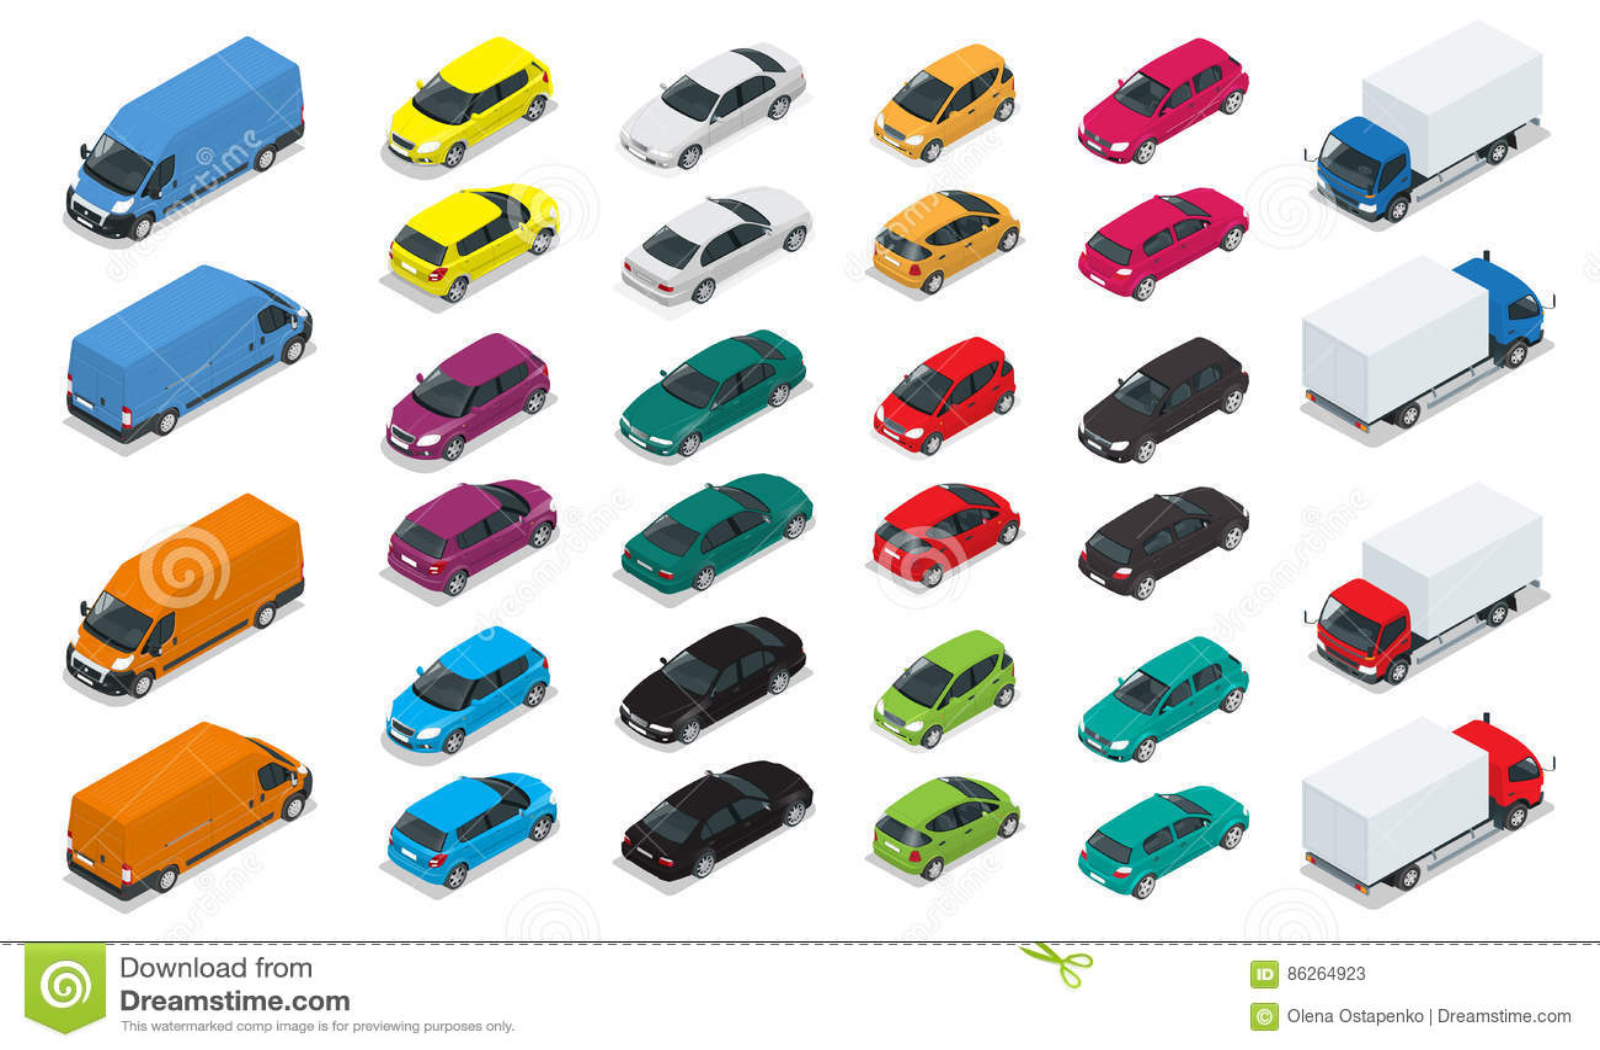 Autoikonen Flacher isometrischer Stadt-Transport der hohen Qualität 3d Limousine, Packwagen, Fracht-LKW, Hecktürmodell Satz städt